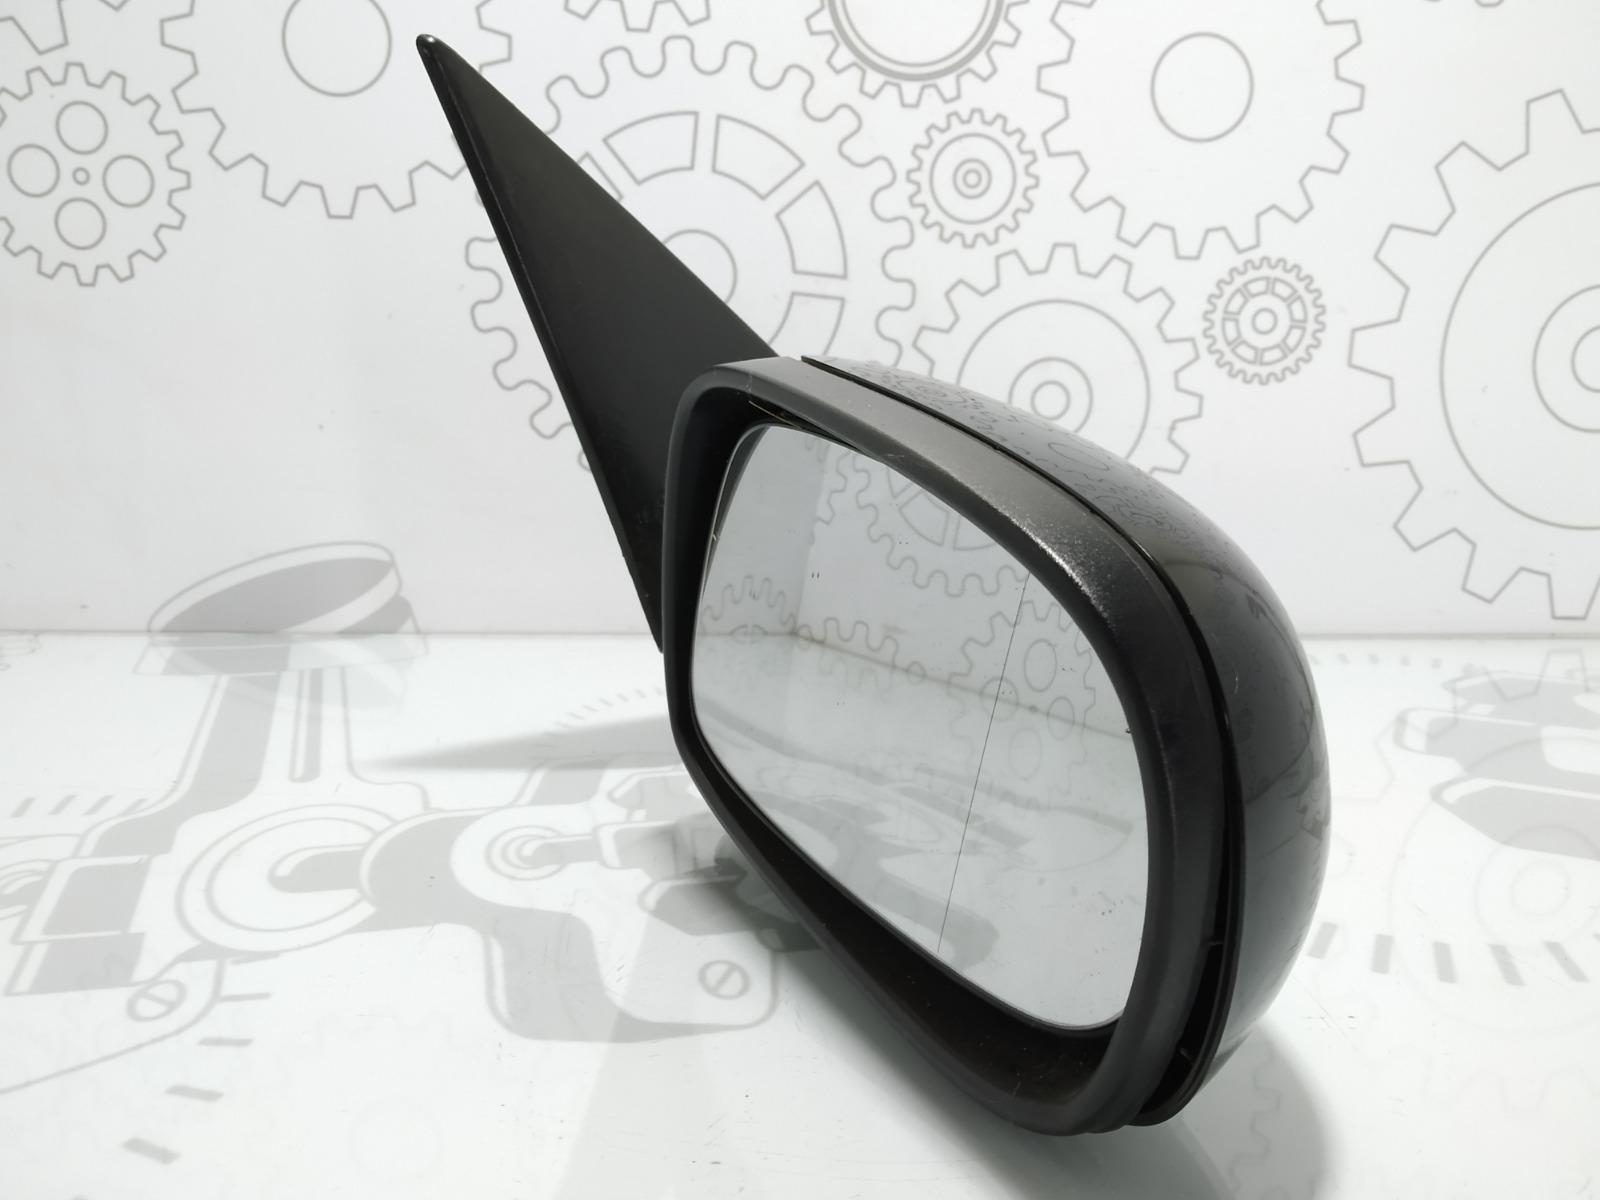 Зеркало наружное правое Saab 9-5 2.2 TID 2004 (б/у)